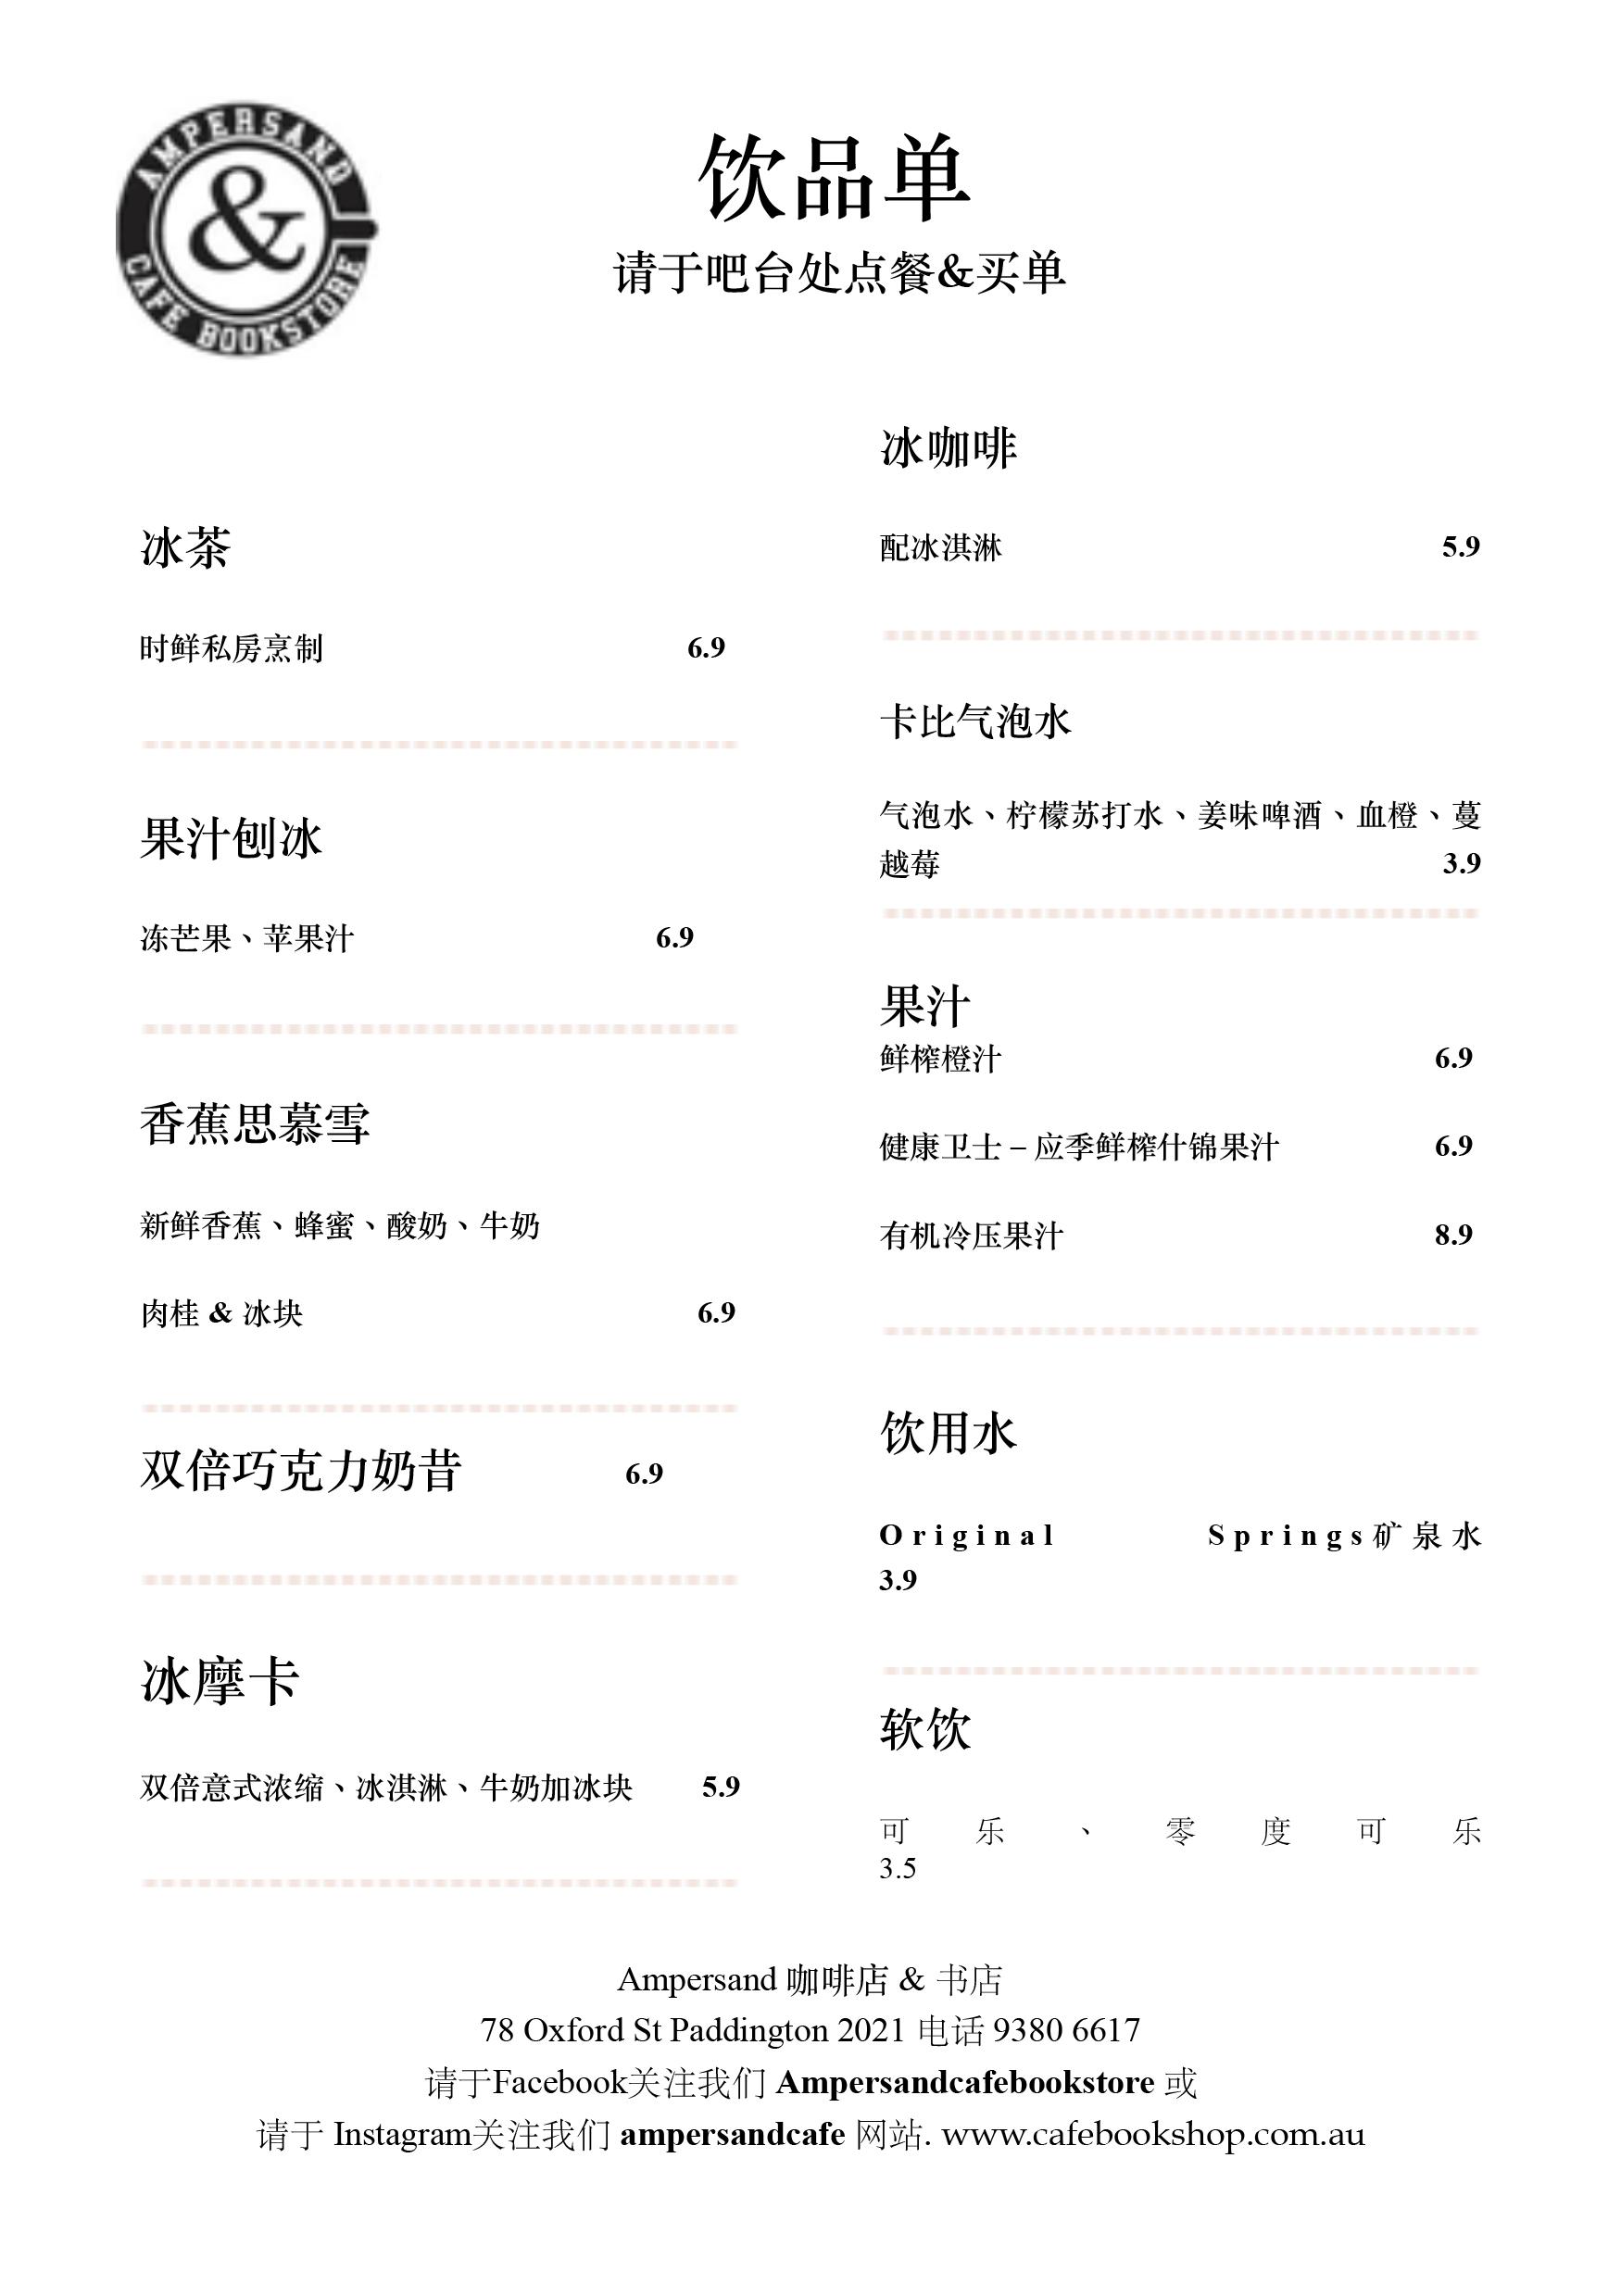 AMPERSAND-MENU-CH-3.png